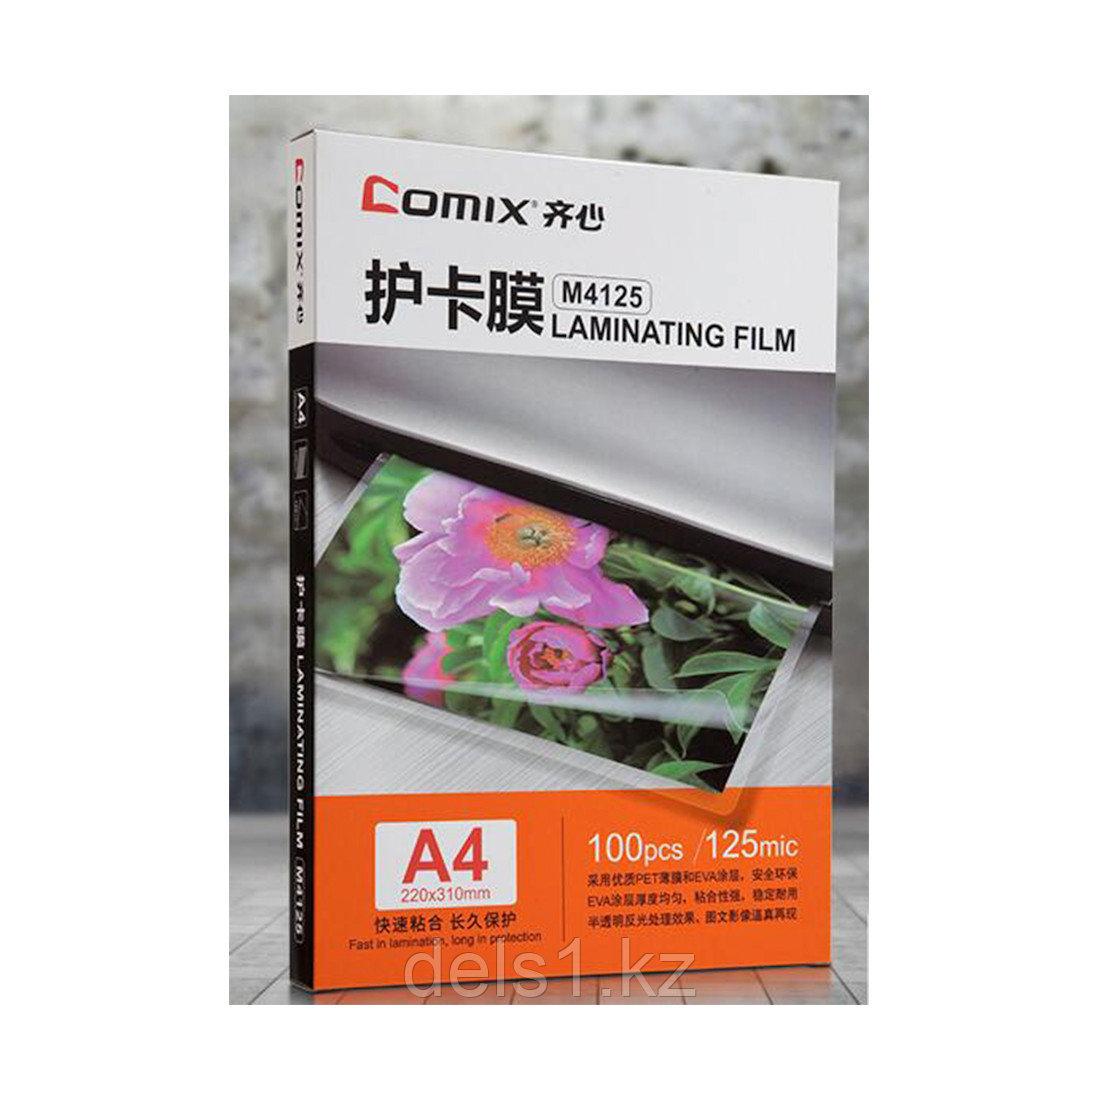 Плёнка для ламинирования COMIX M4125 А4, 125мкм, 100шт.